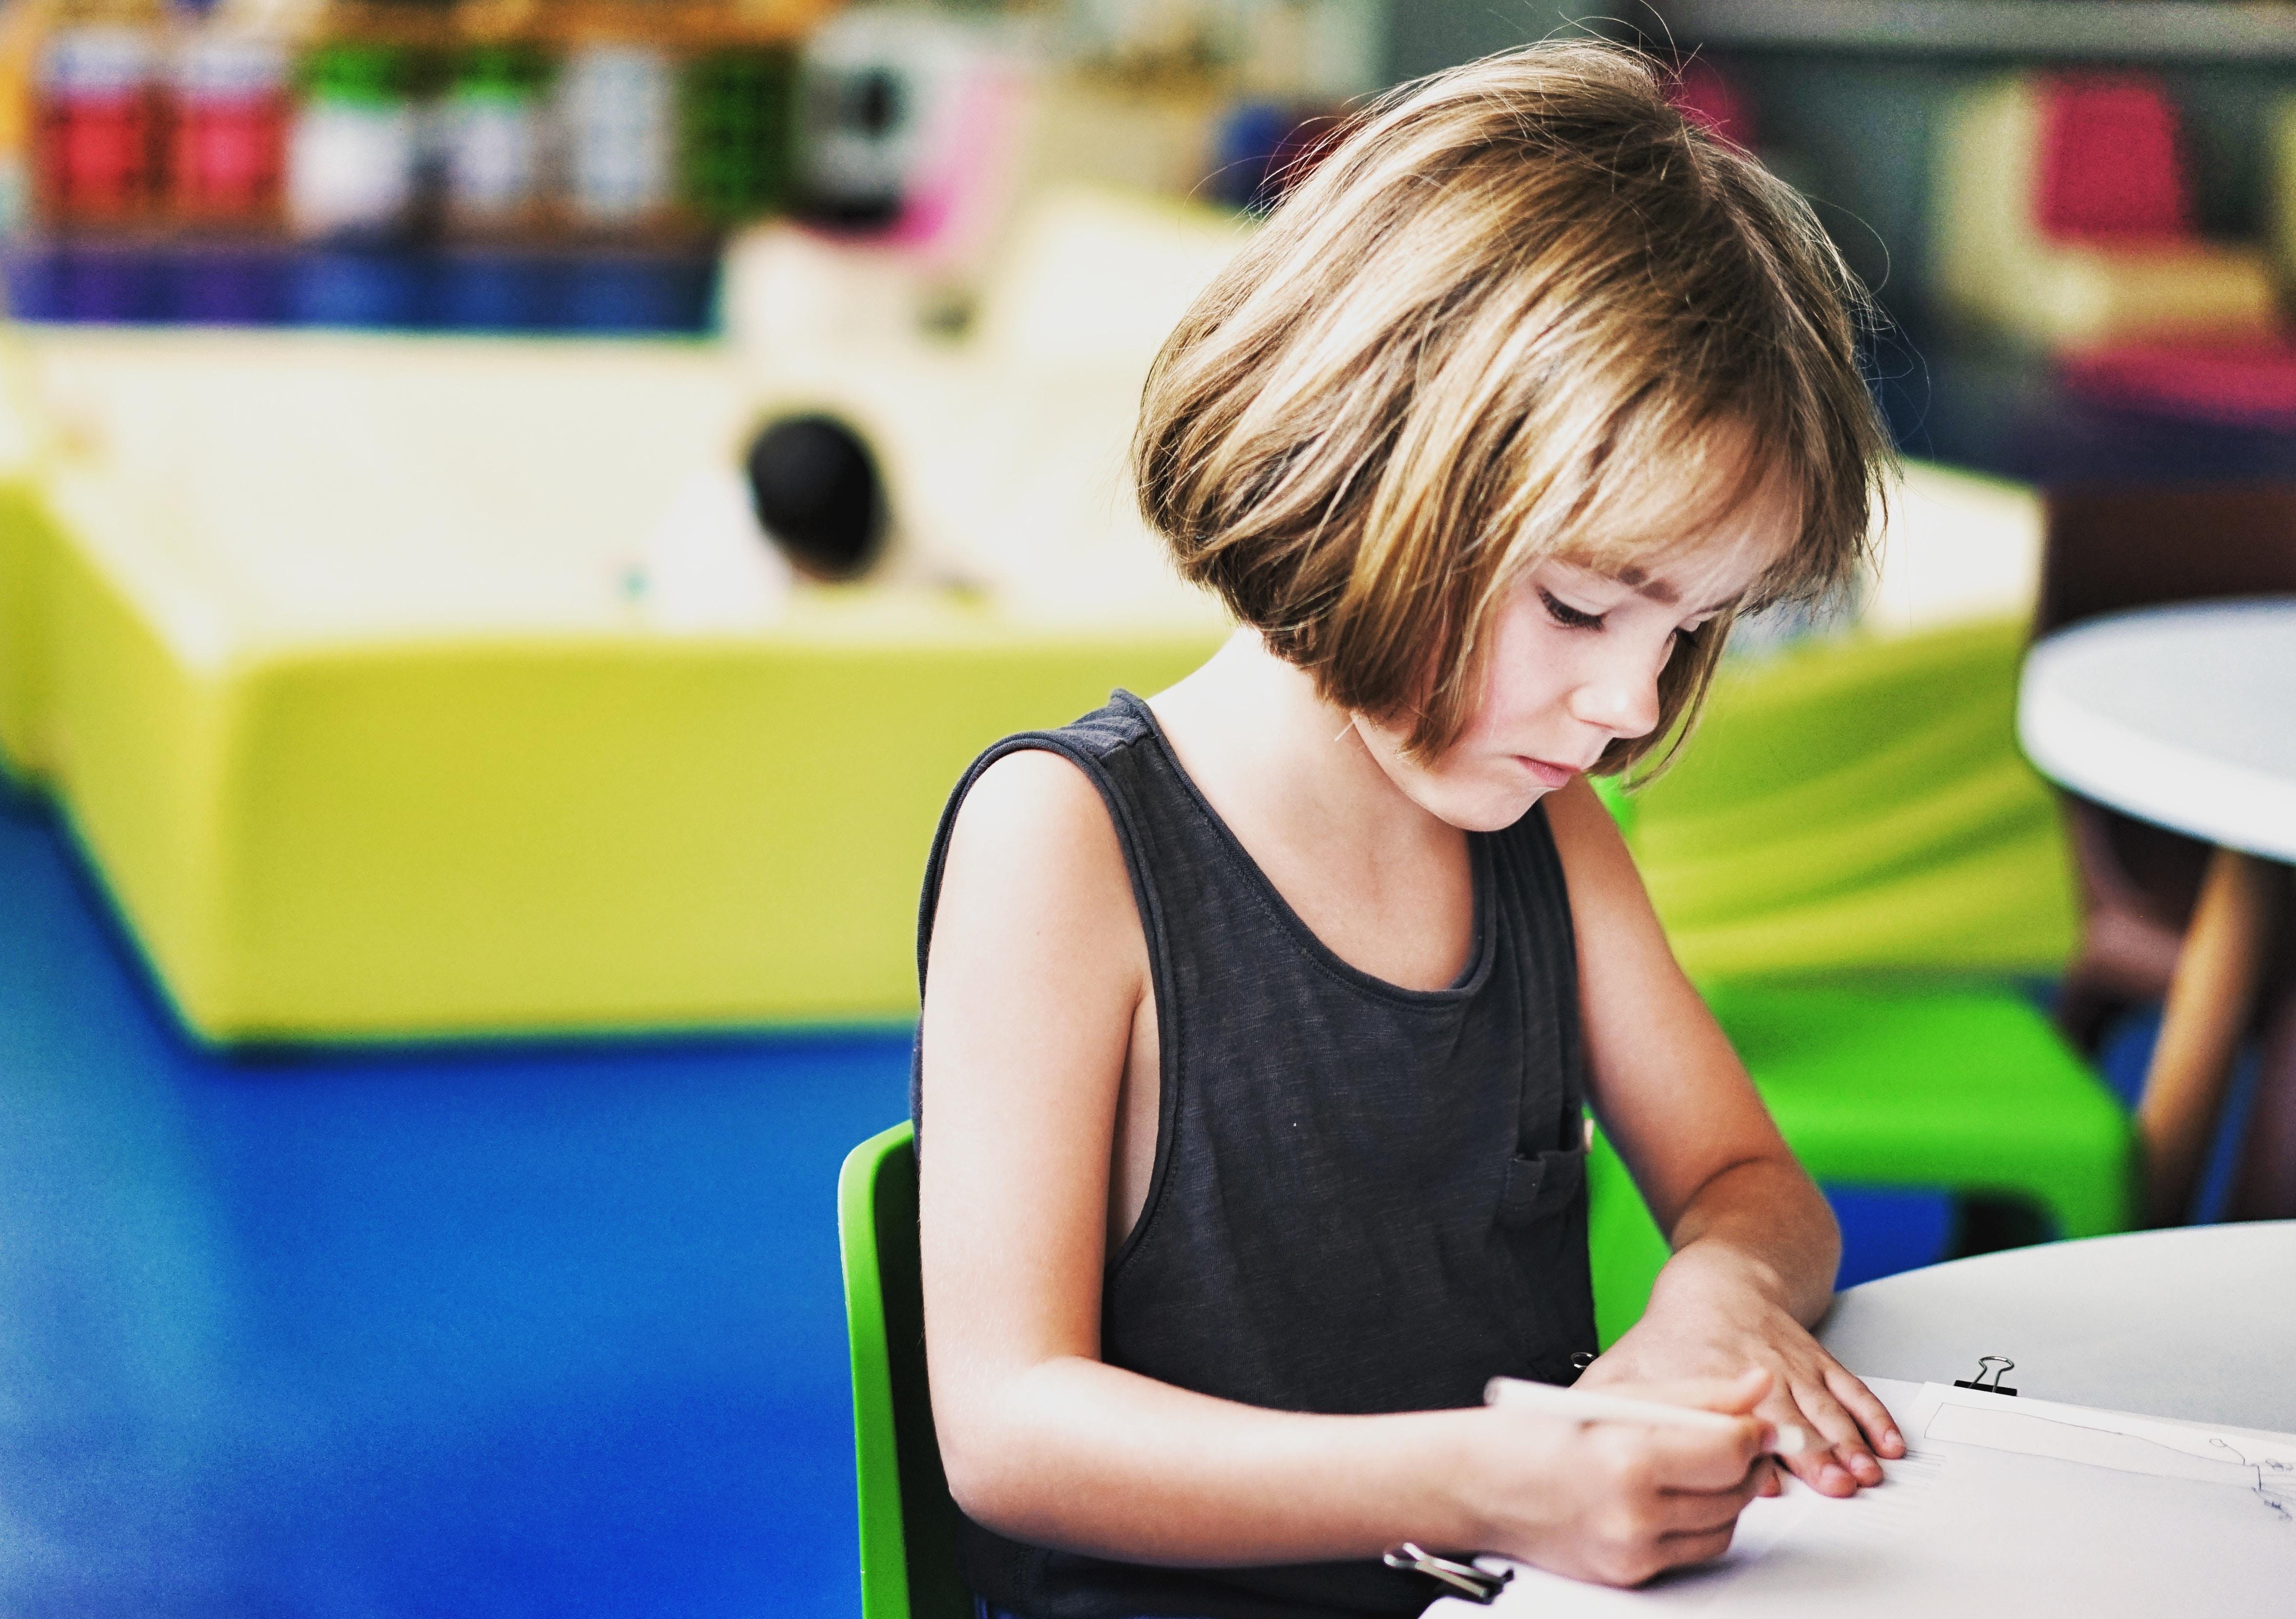 Girl Working on Math